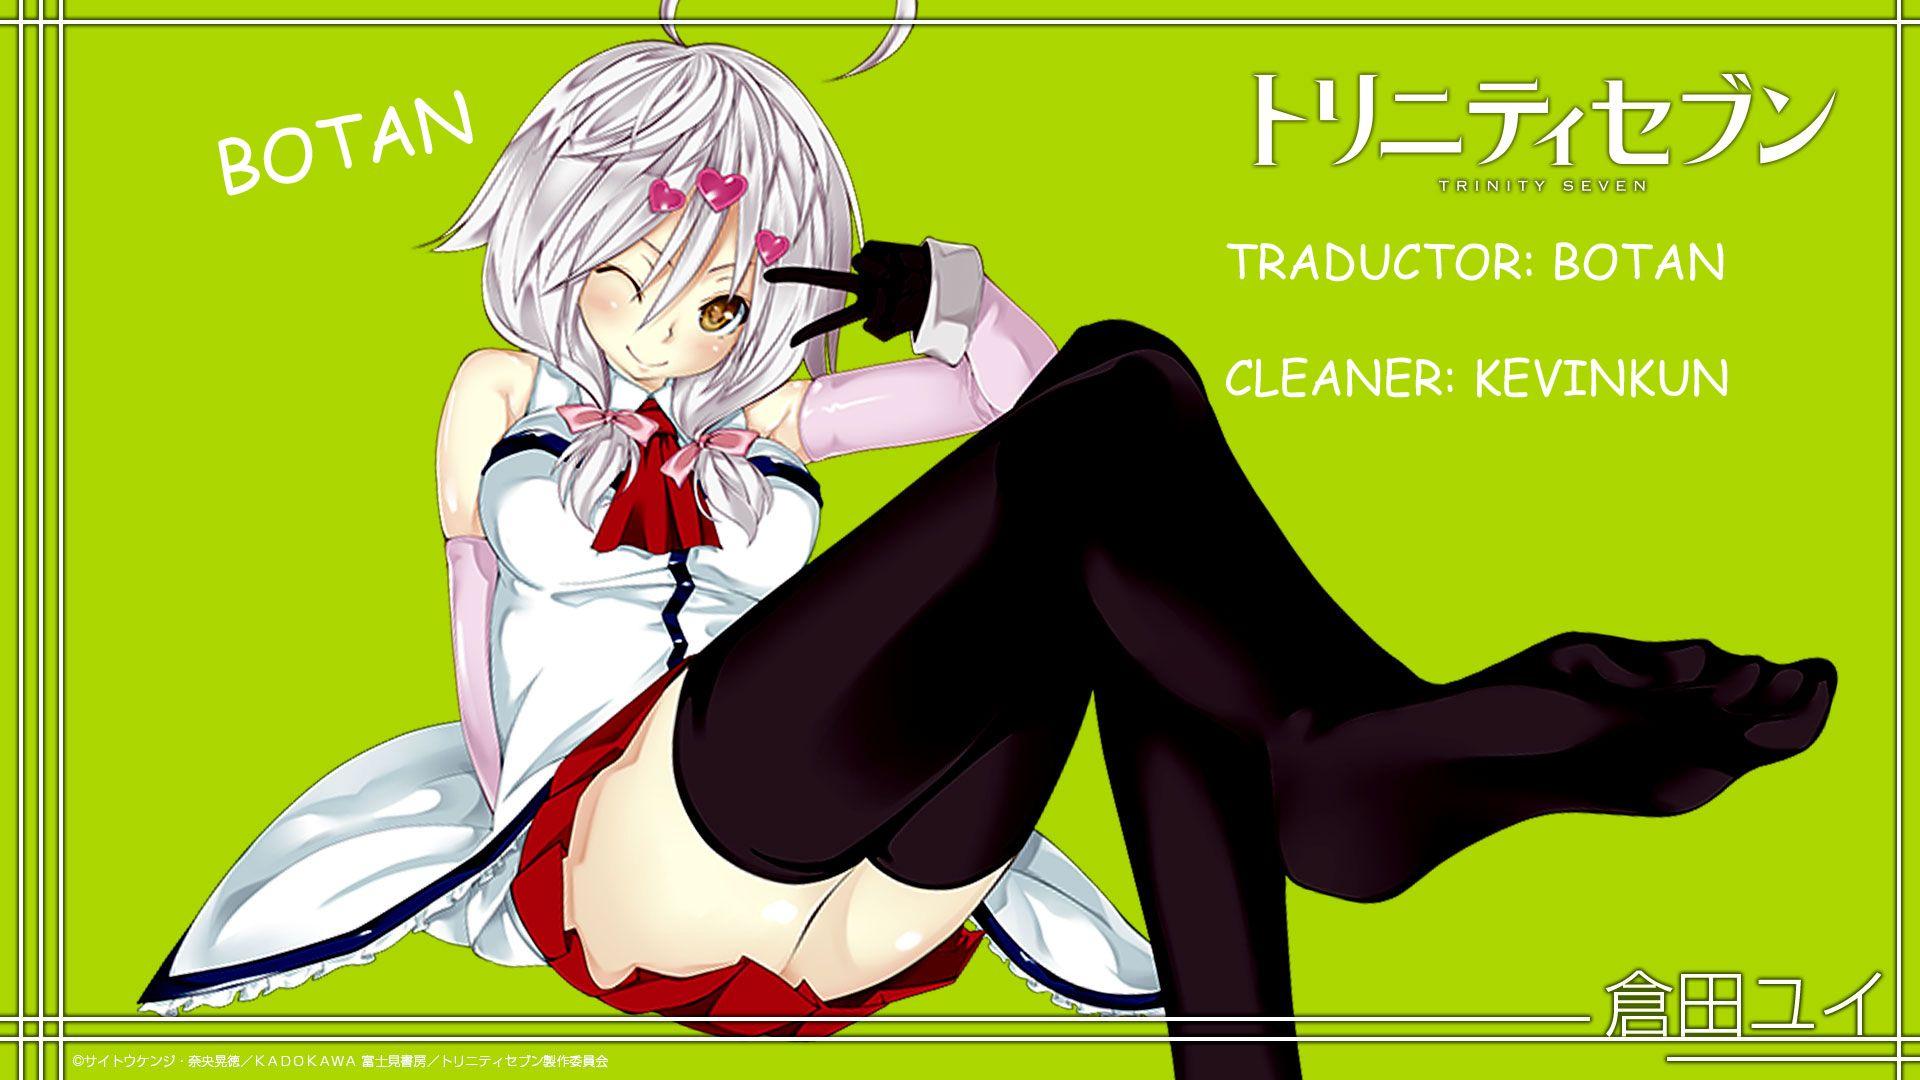 https://c5.ninemanga.com/es_manga/37/19685/463765/0783683c446cf52f9df7d90d92bf5239.jpg Page 1